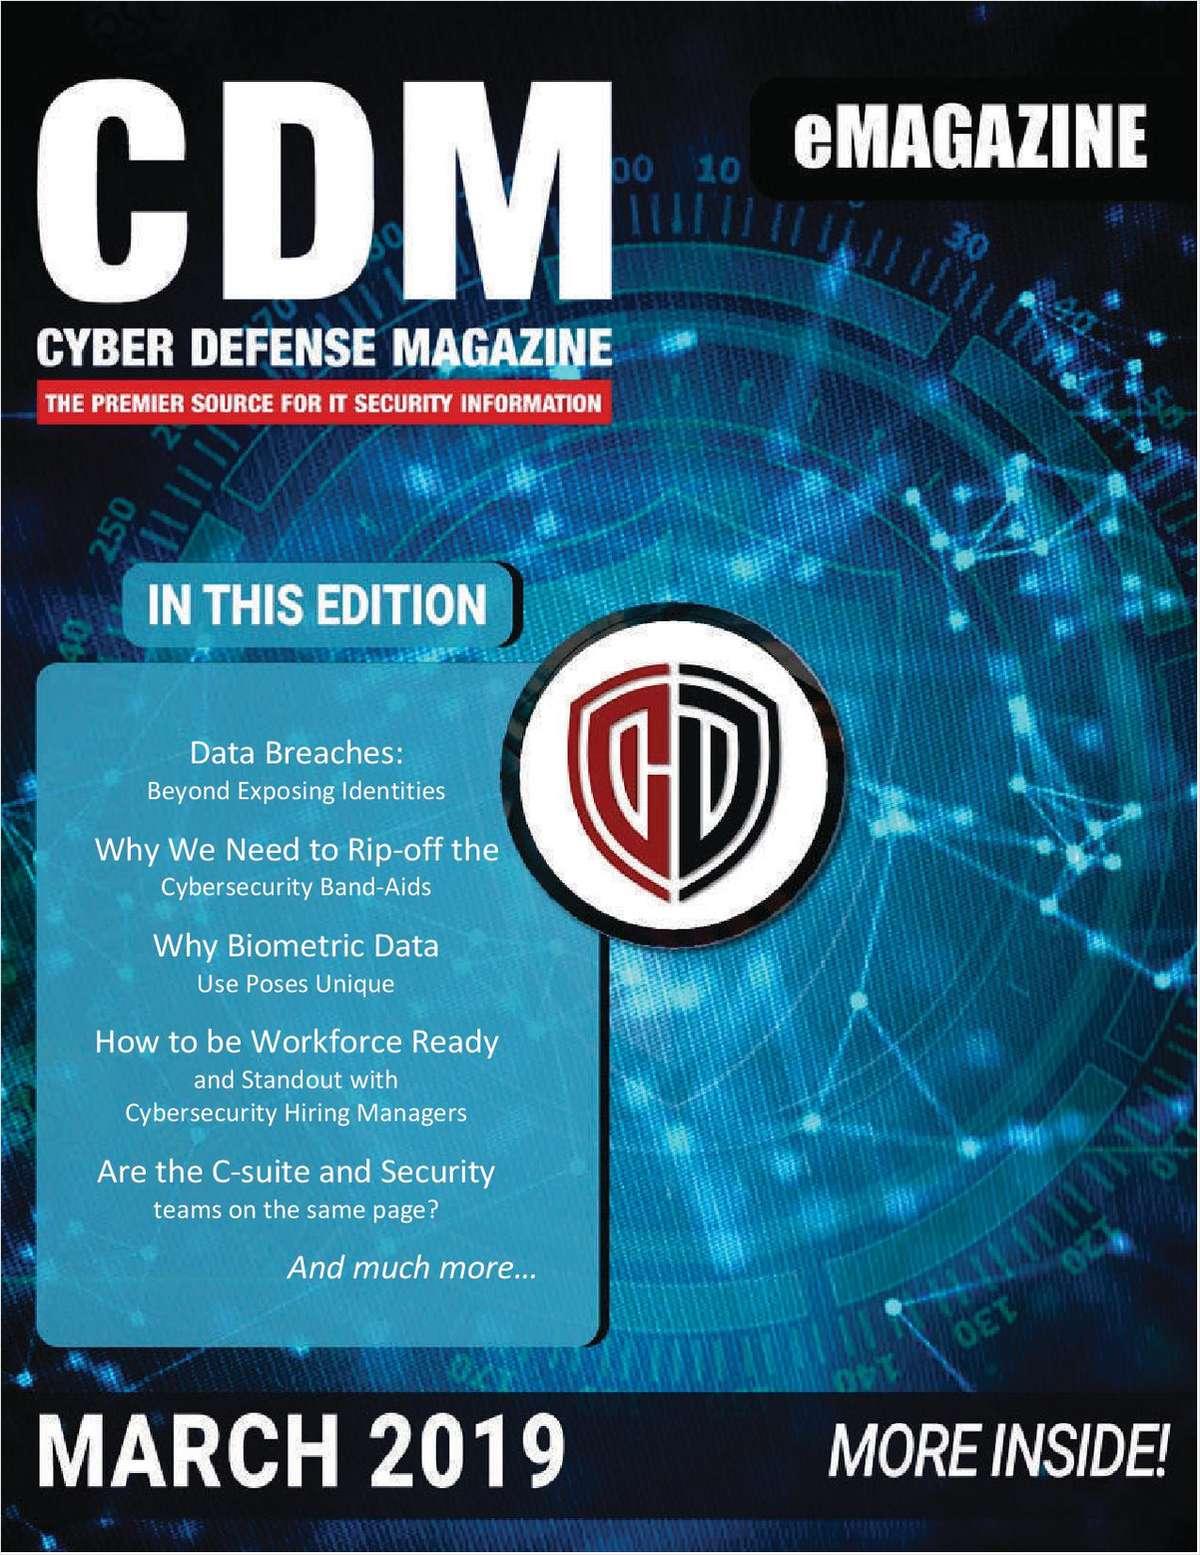 Cyber Defense eMagazine - March 2019 Edition